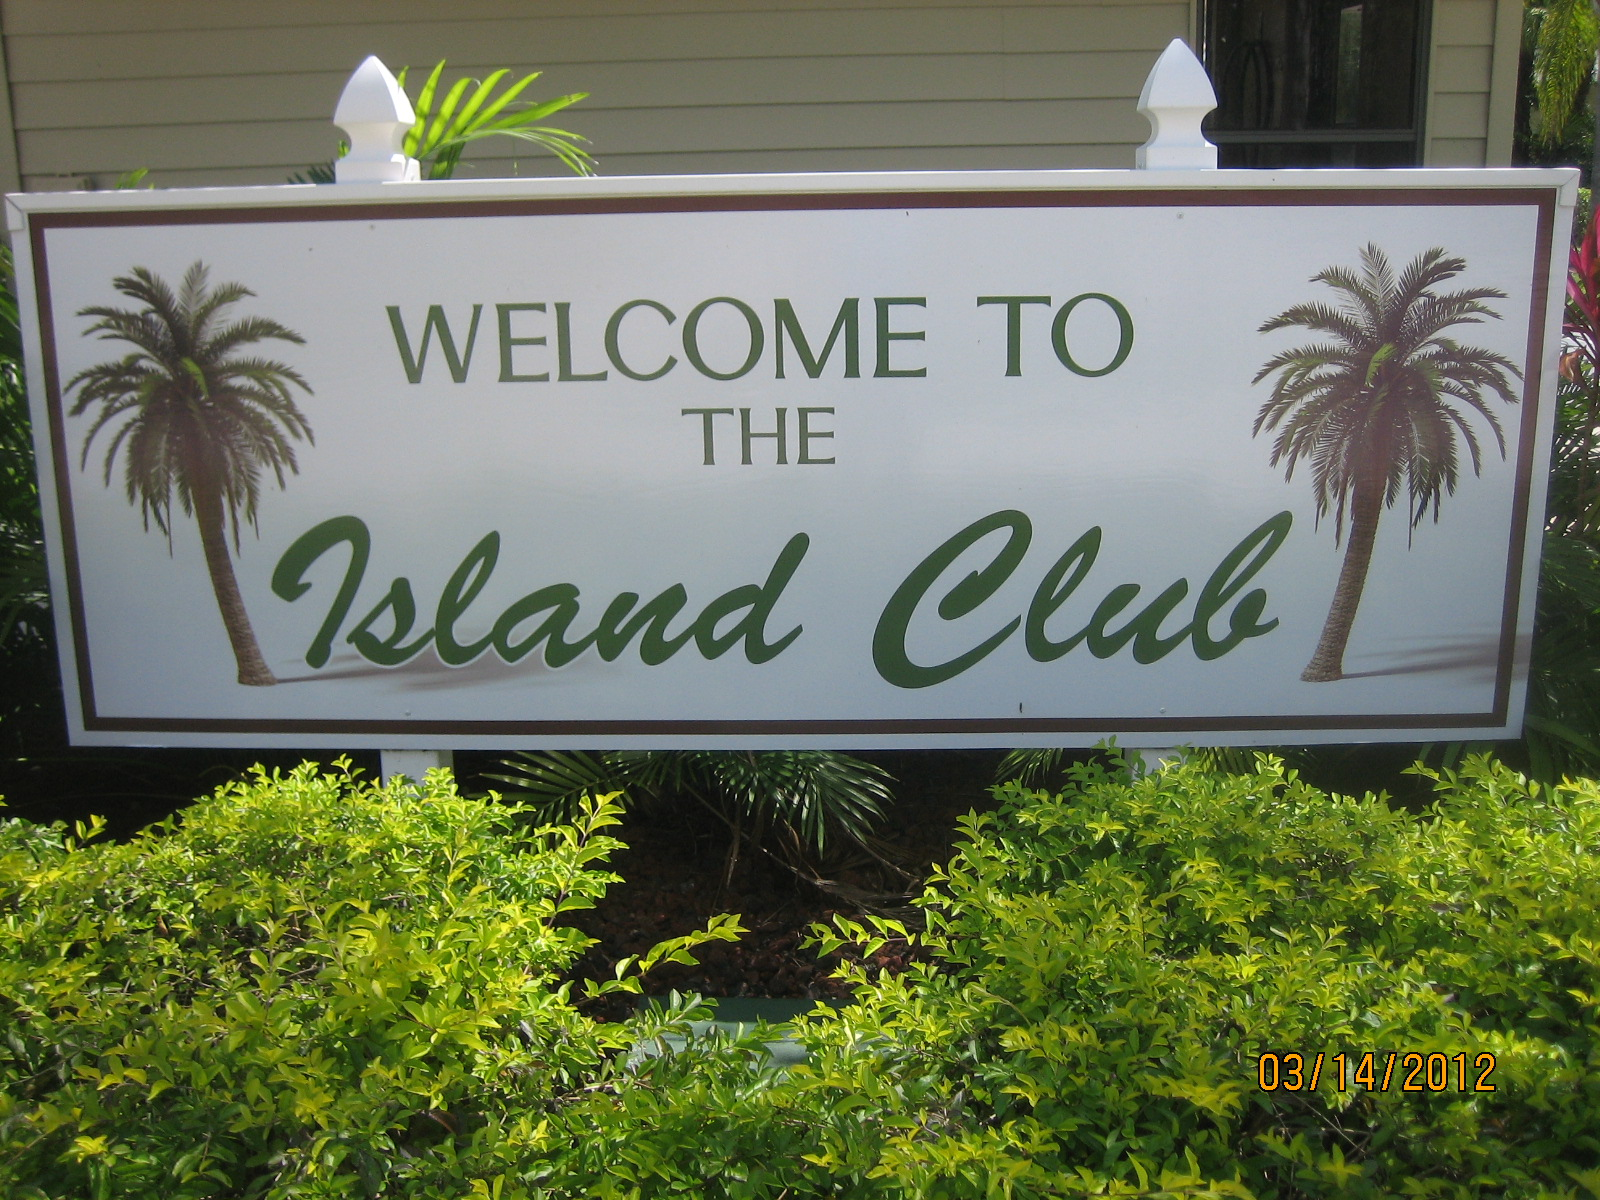 About Island Club HOA